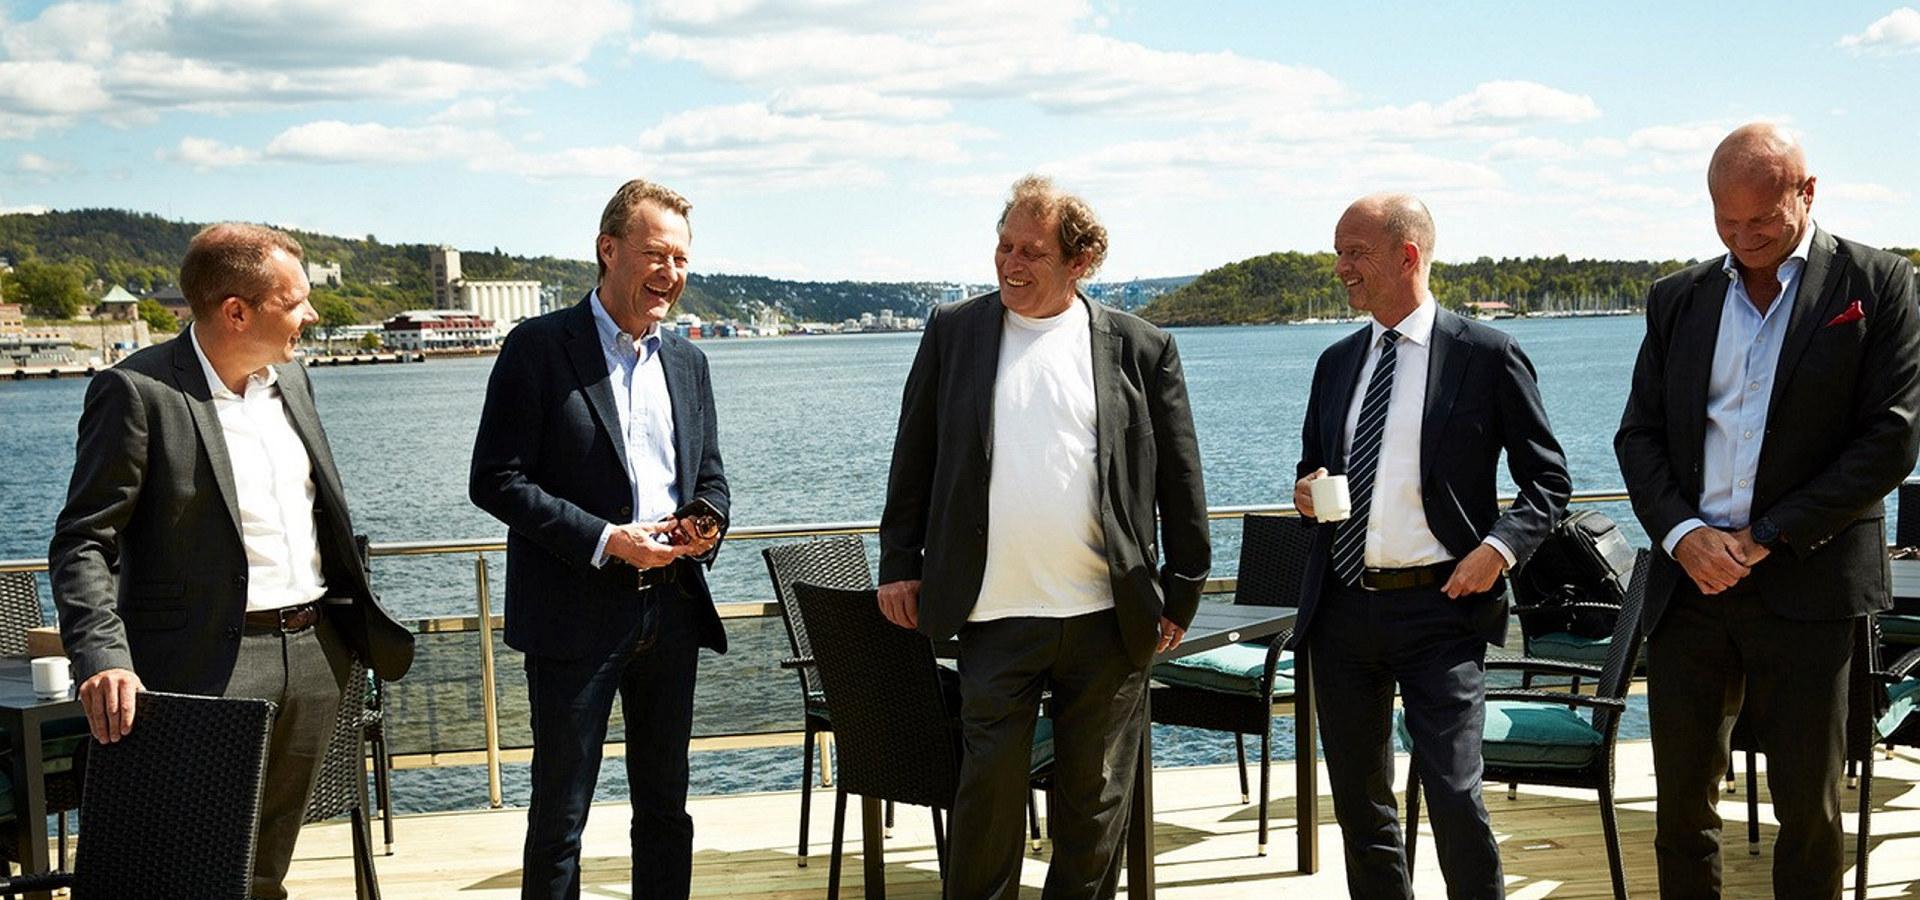 Fem menn på en båt